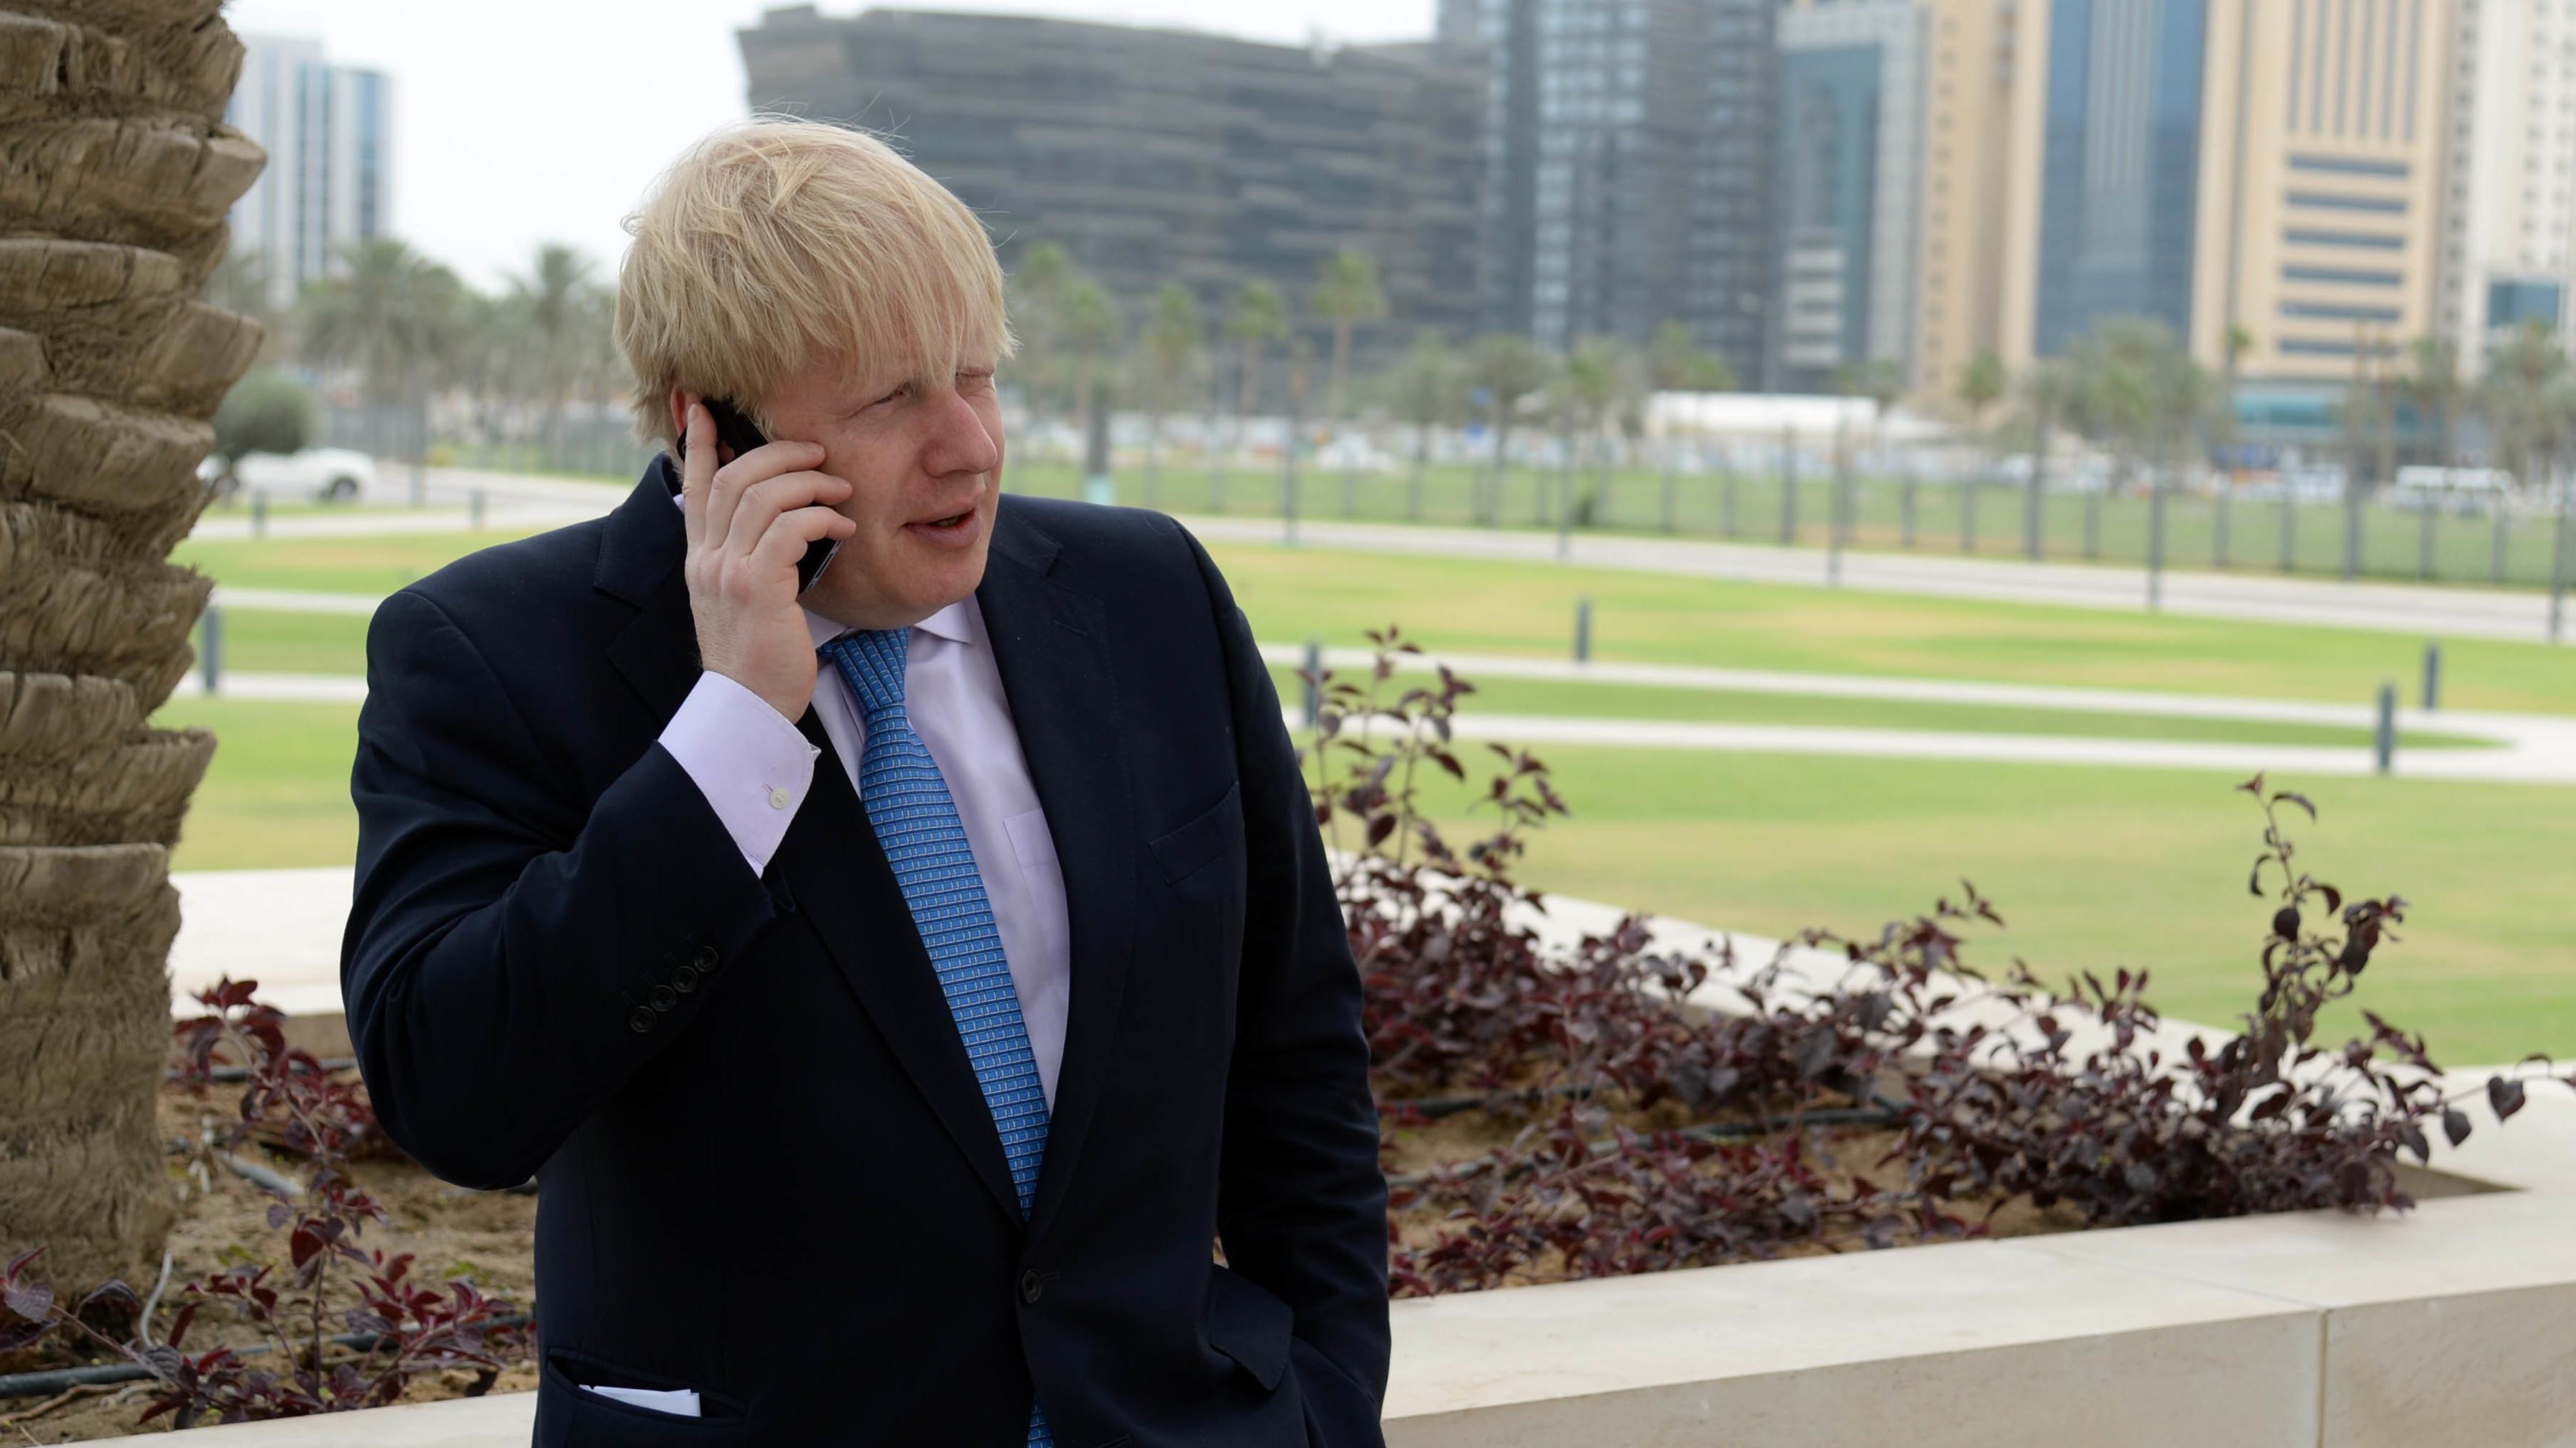 Symbolbild: Minister bekamen ungebetene Anrufe